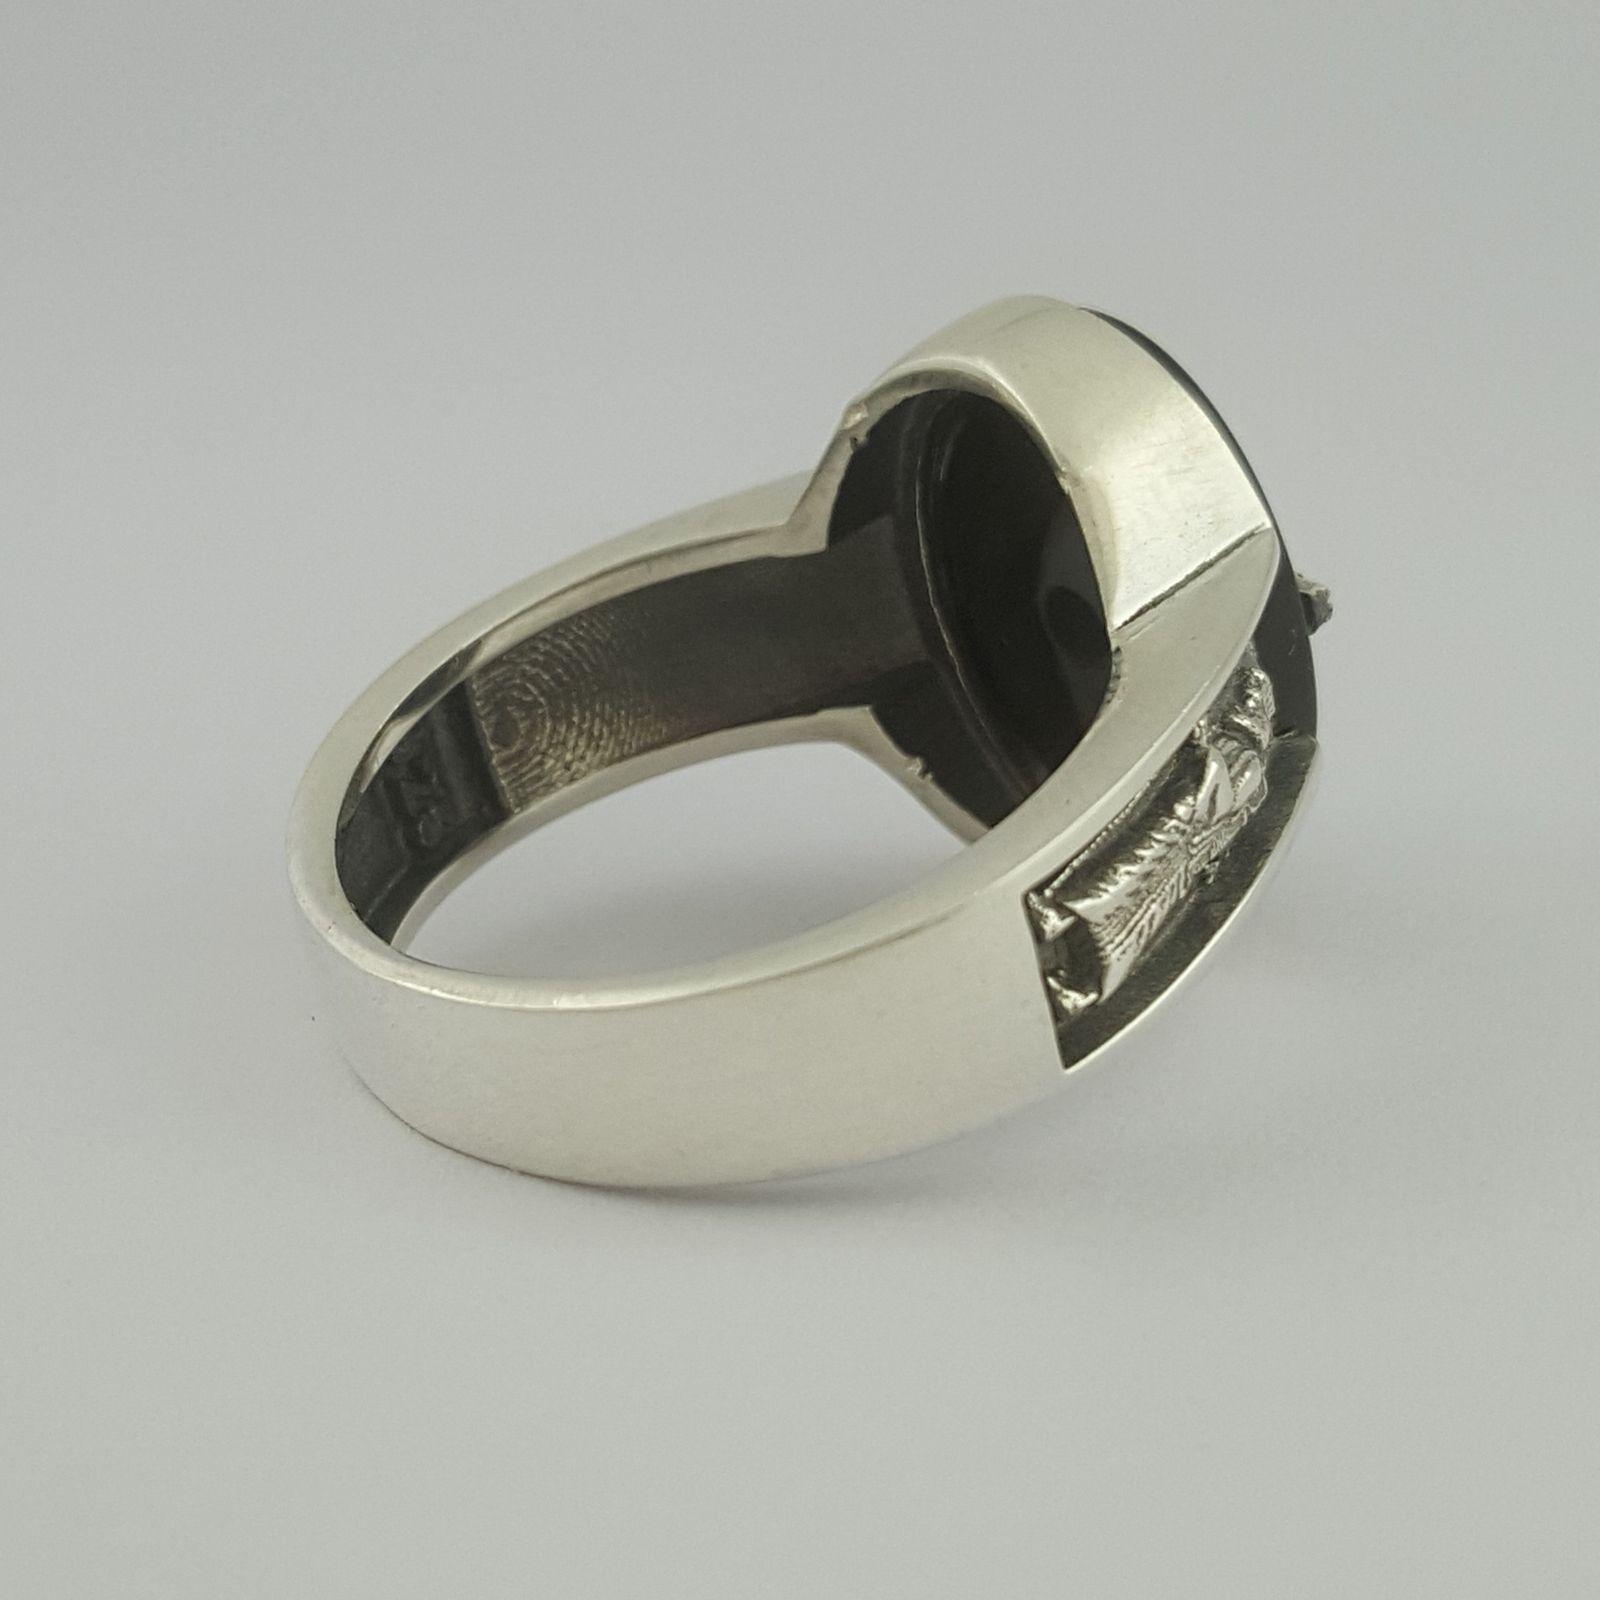 انگشتر نقره مردانه بلو استون کد 1070-63 -  - 3